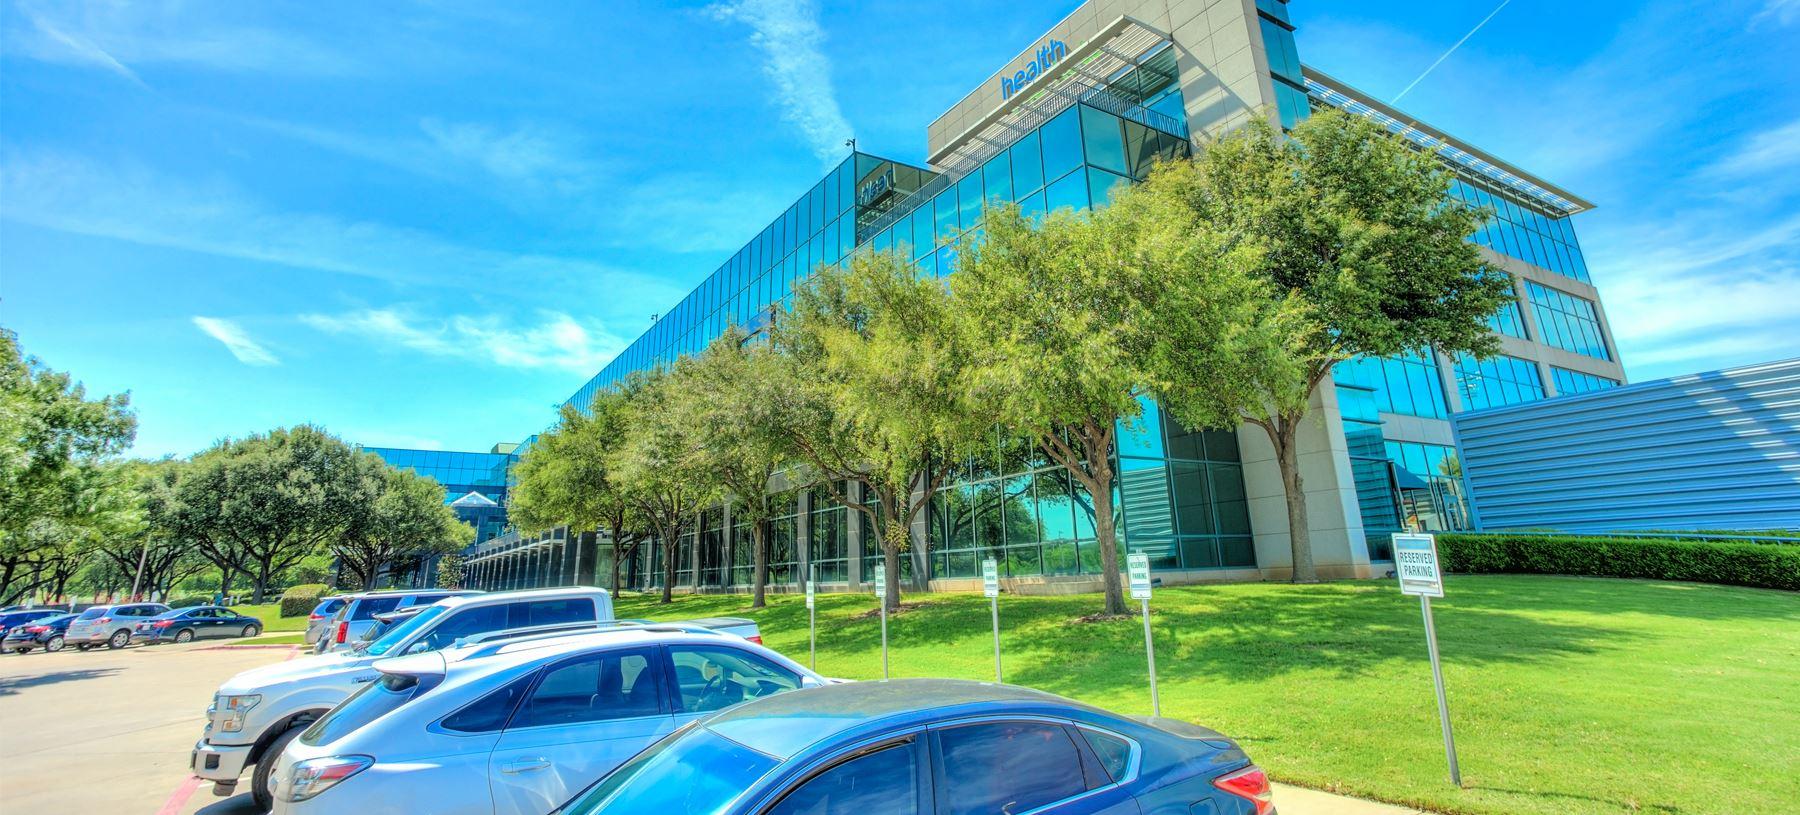 North Richland Hills Economic Development, TX | Official Website